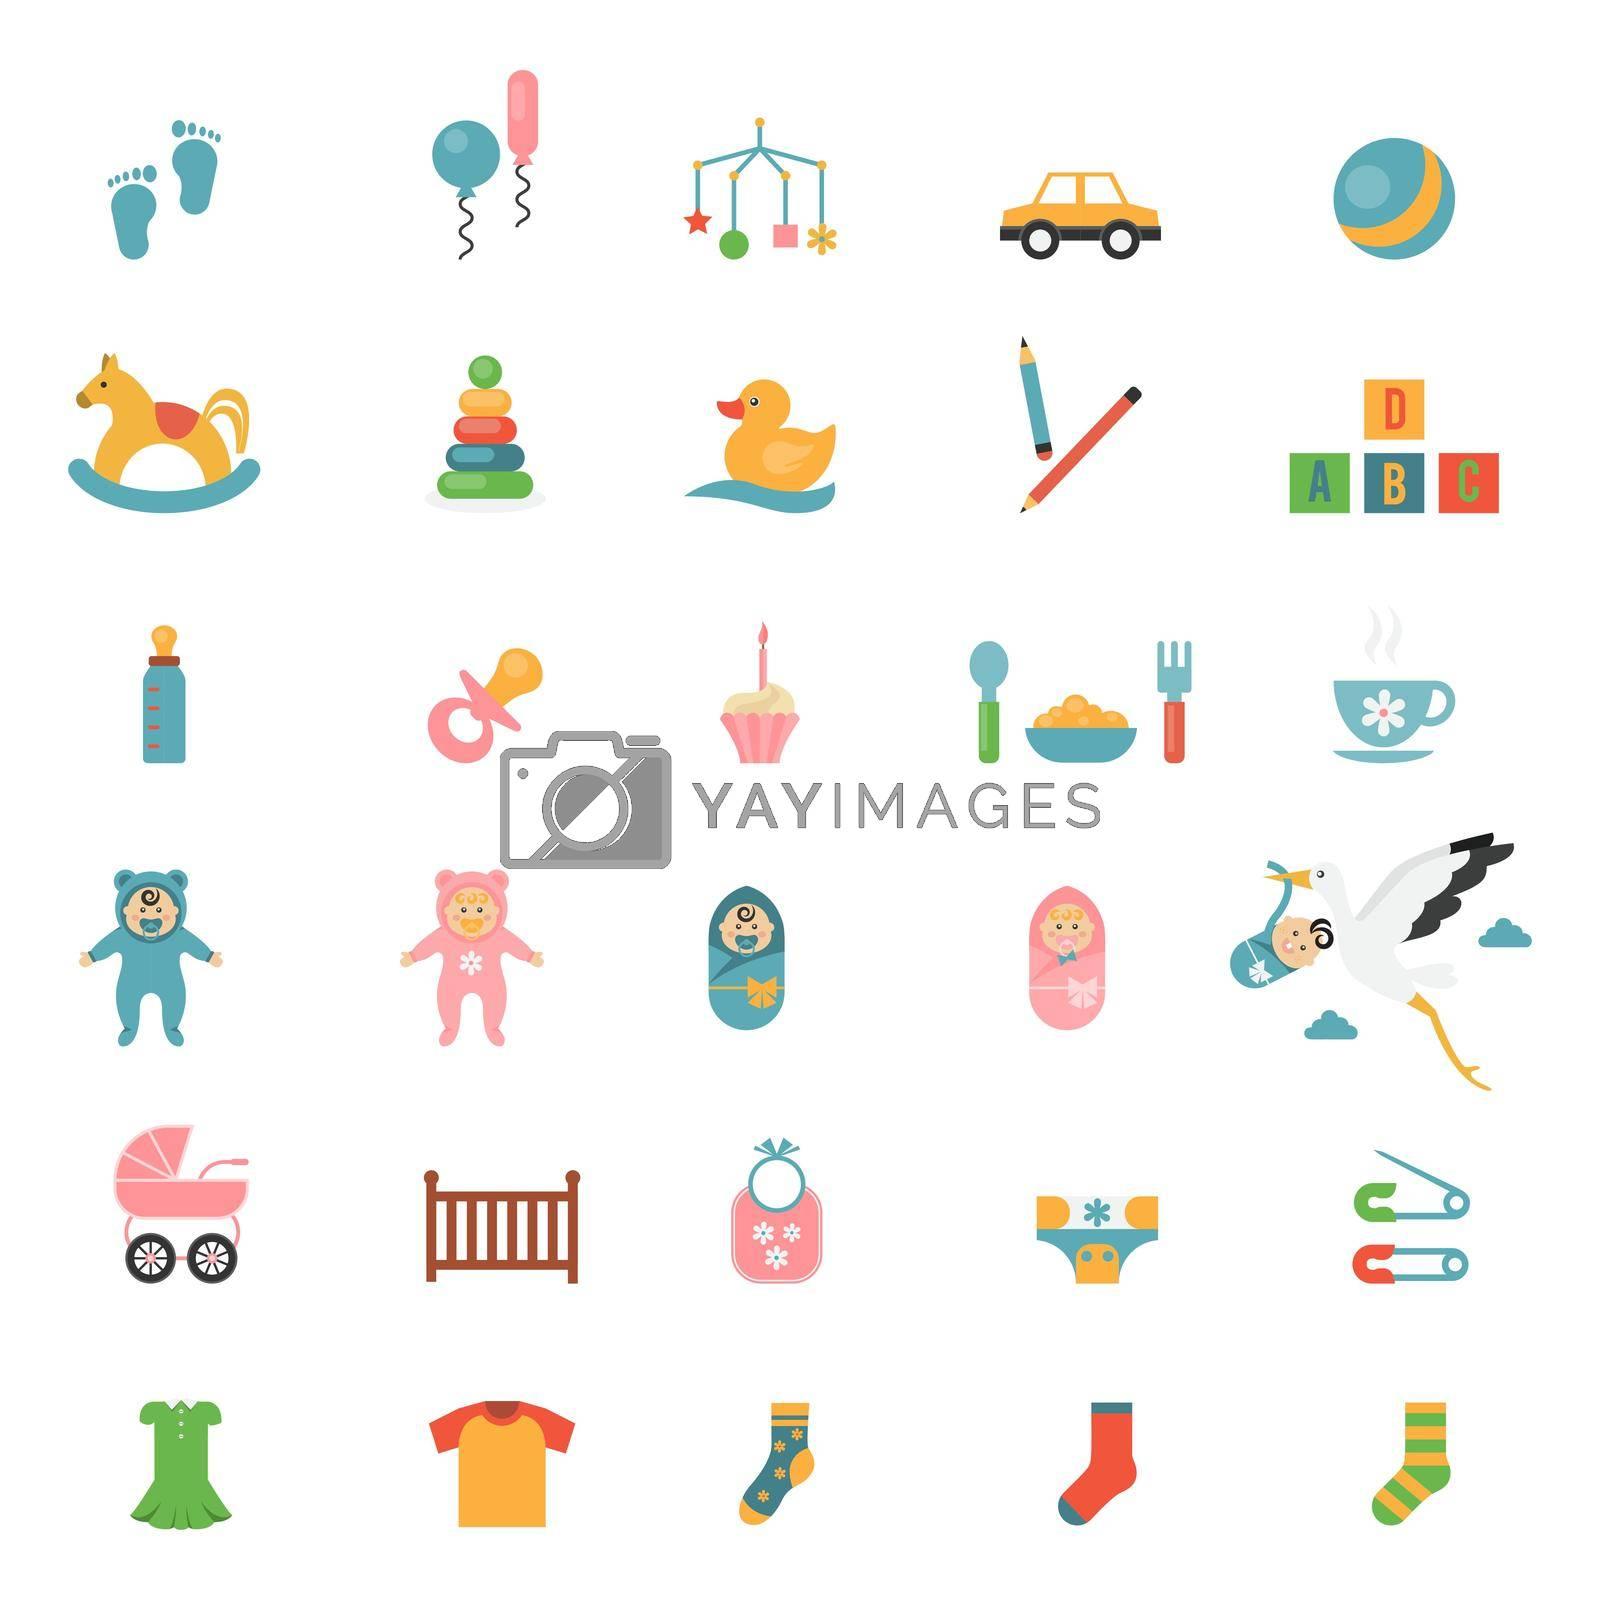 Royalty free image of Babies toys icons by mstjahanara